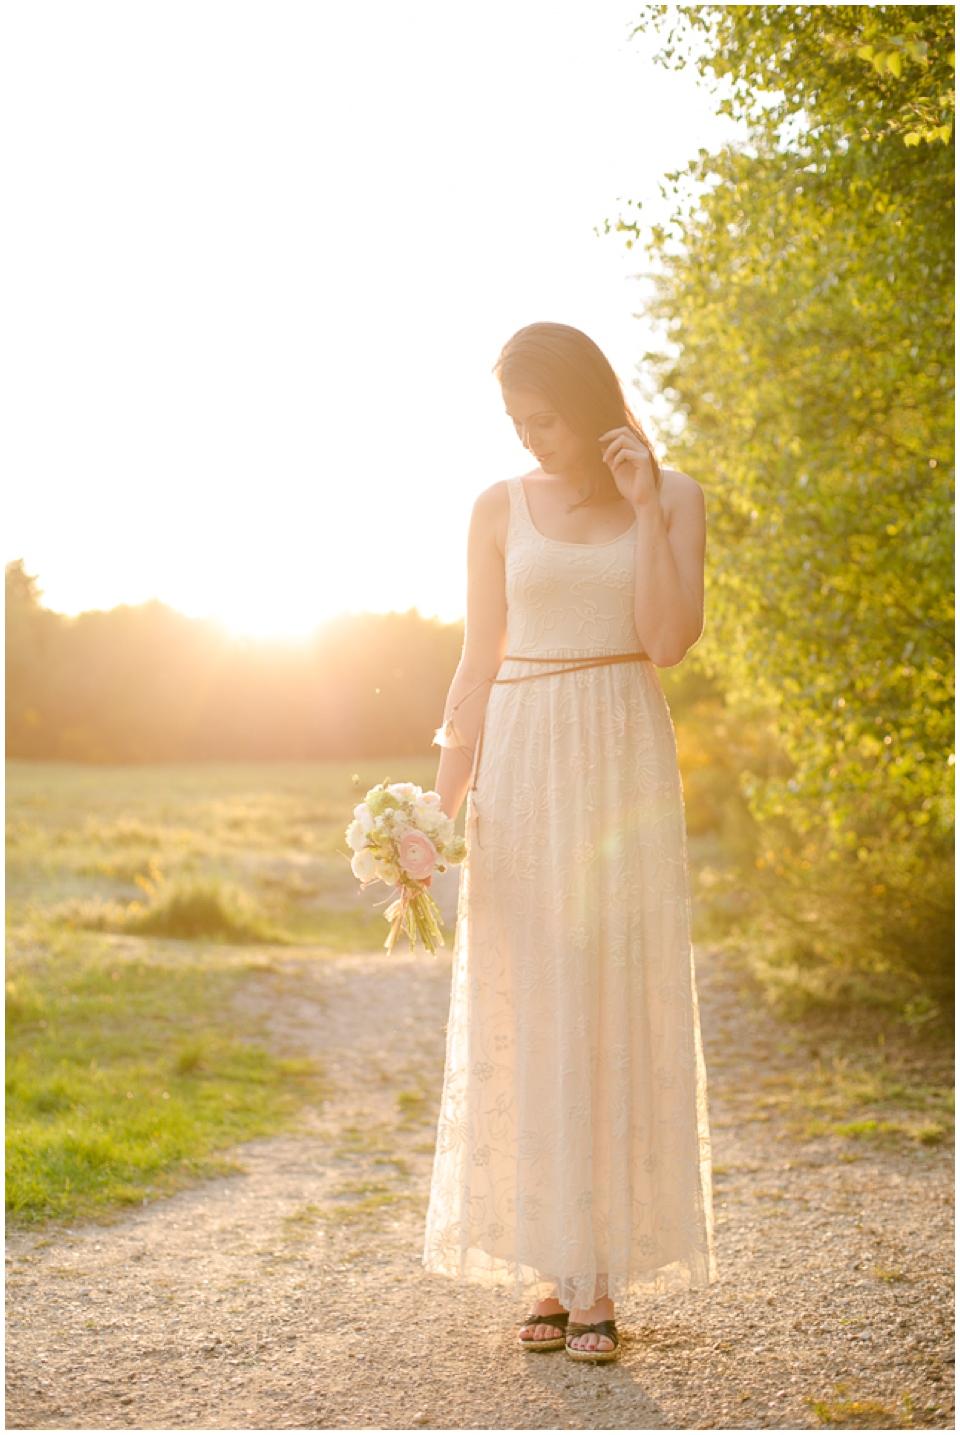 Nicole Wahl Fotografie - Imagefilm_0001